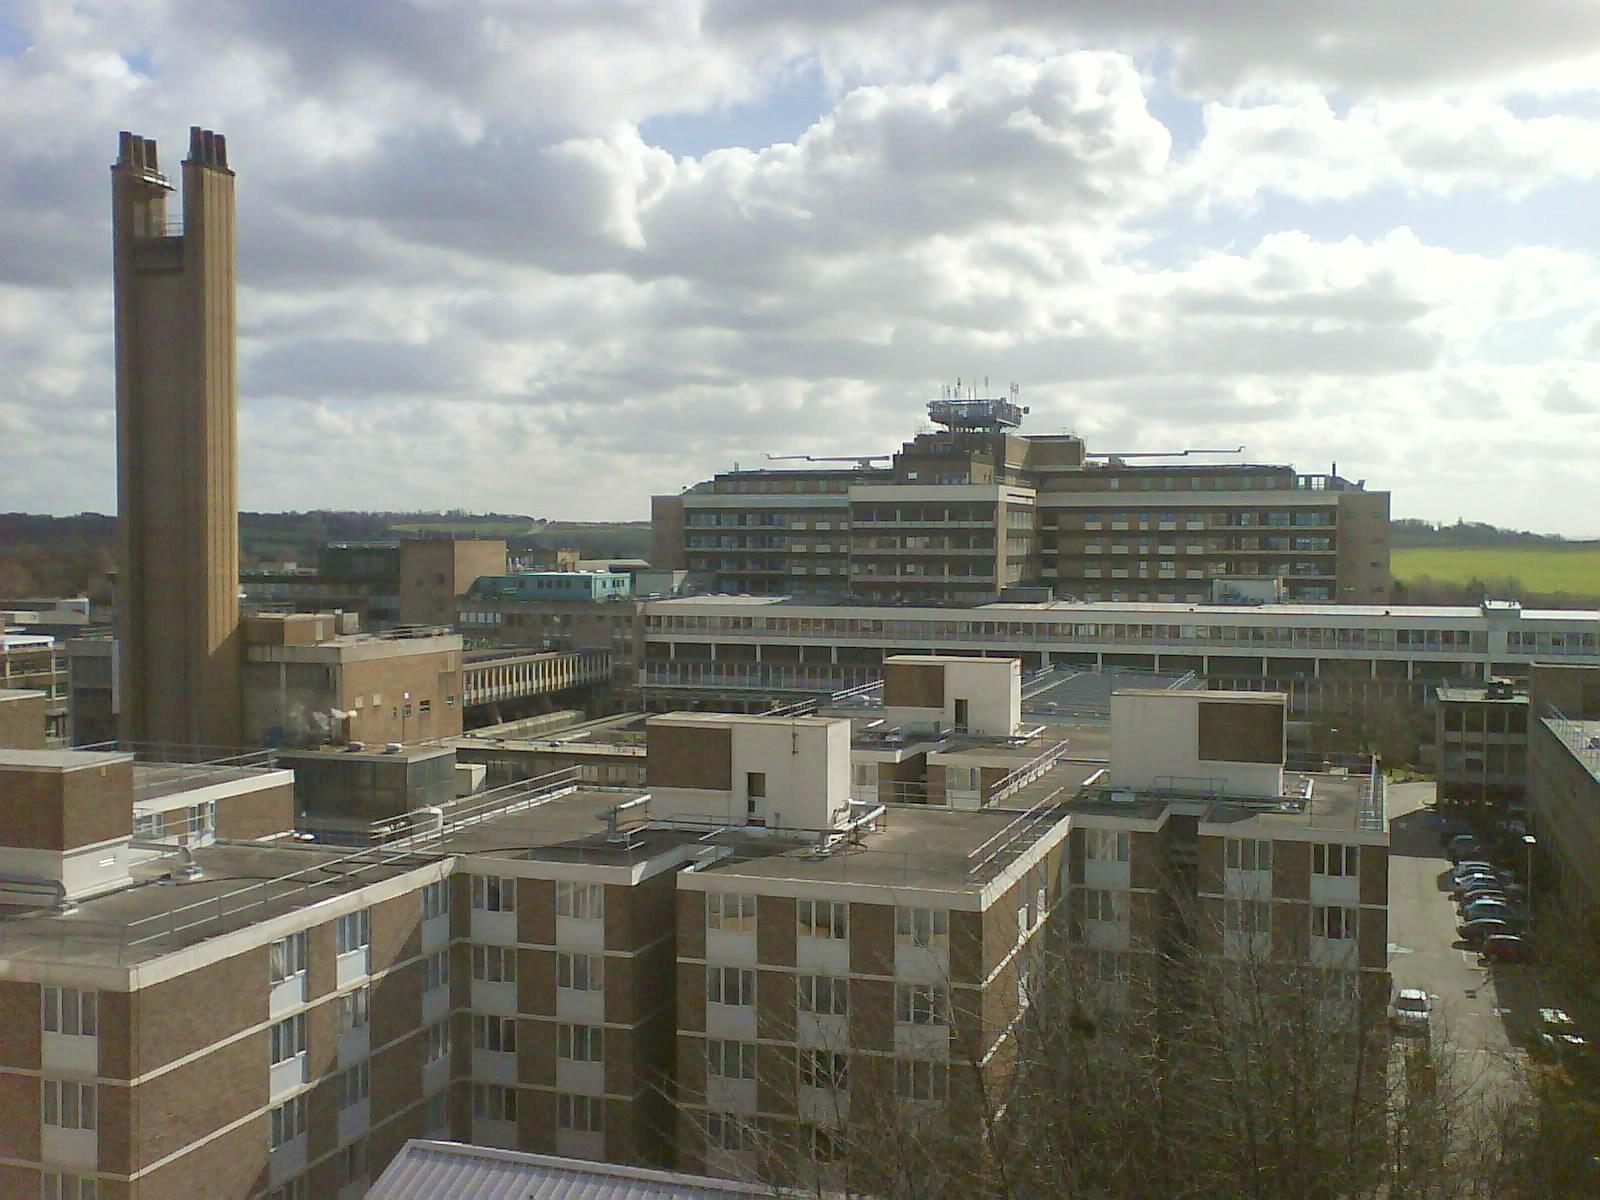 Addenbrooke's Hospital - Wikipedia